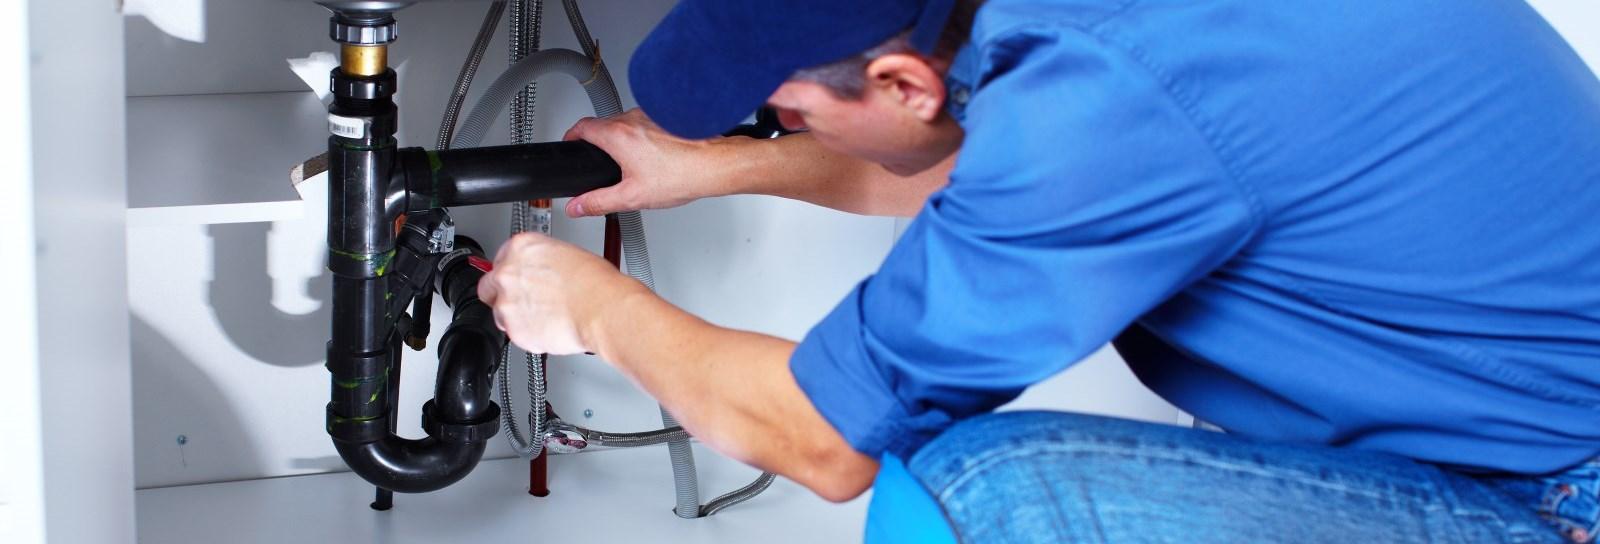 plumbers beddington